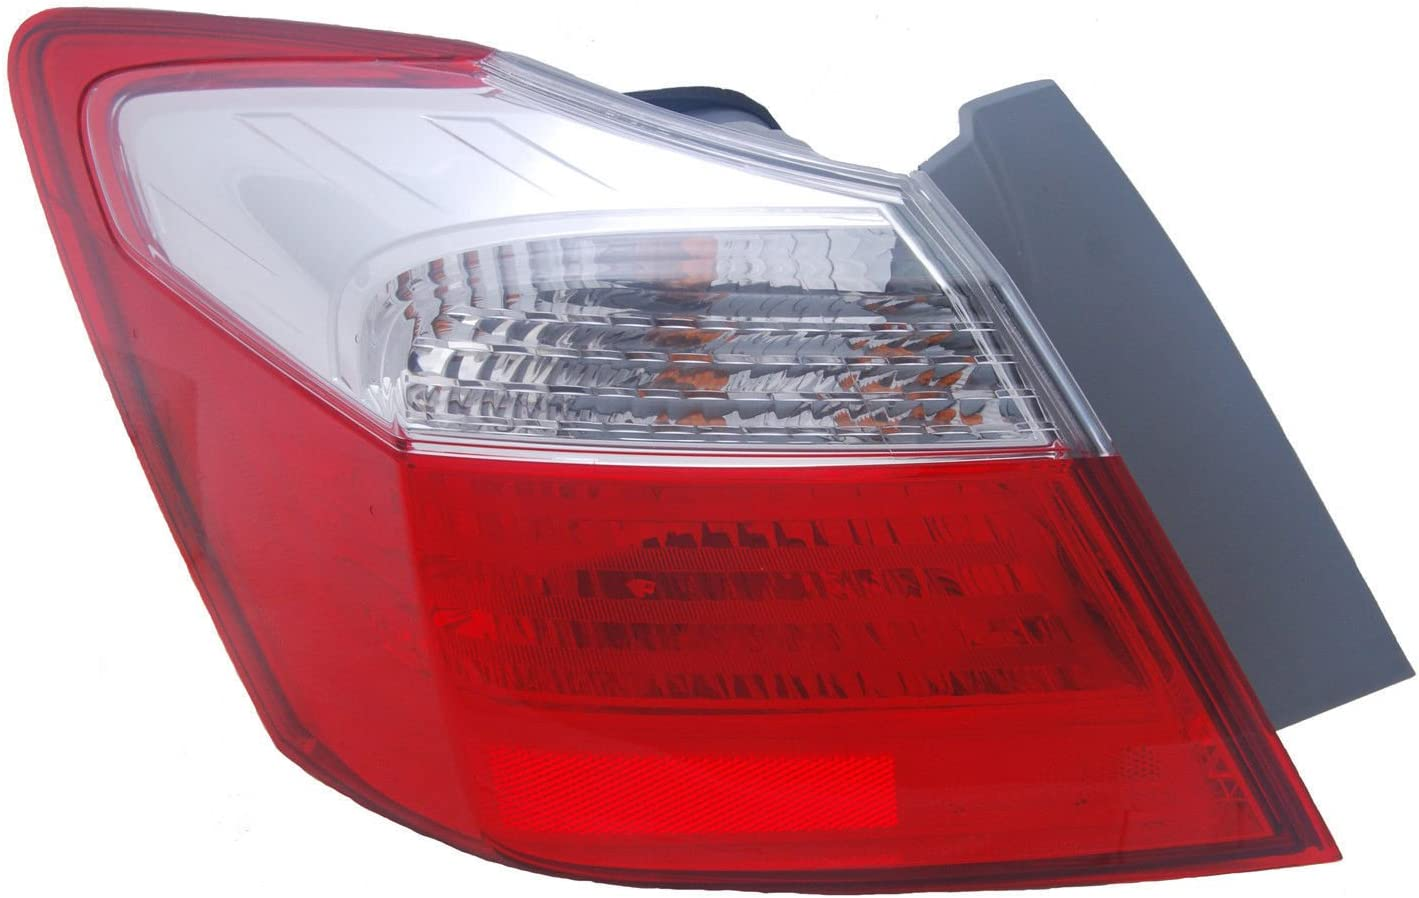 TYC 11-6530-00 Honda Accord Replacement Tail Lamp